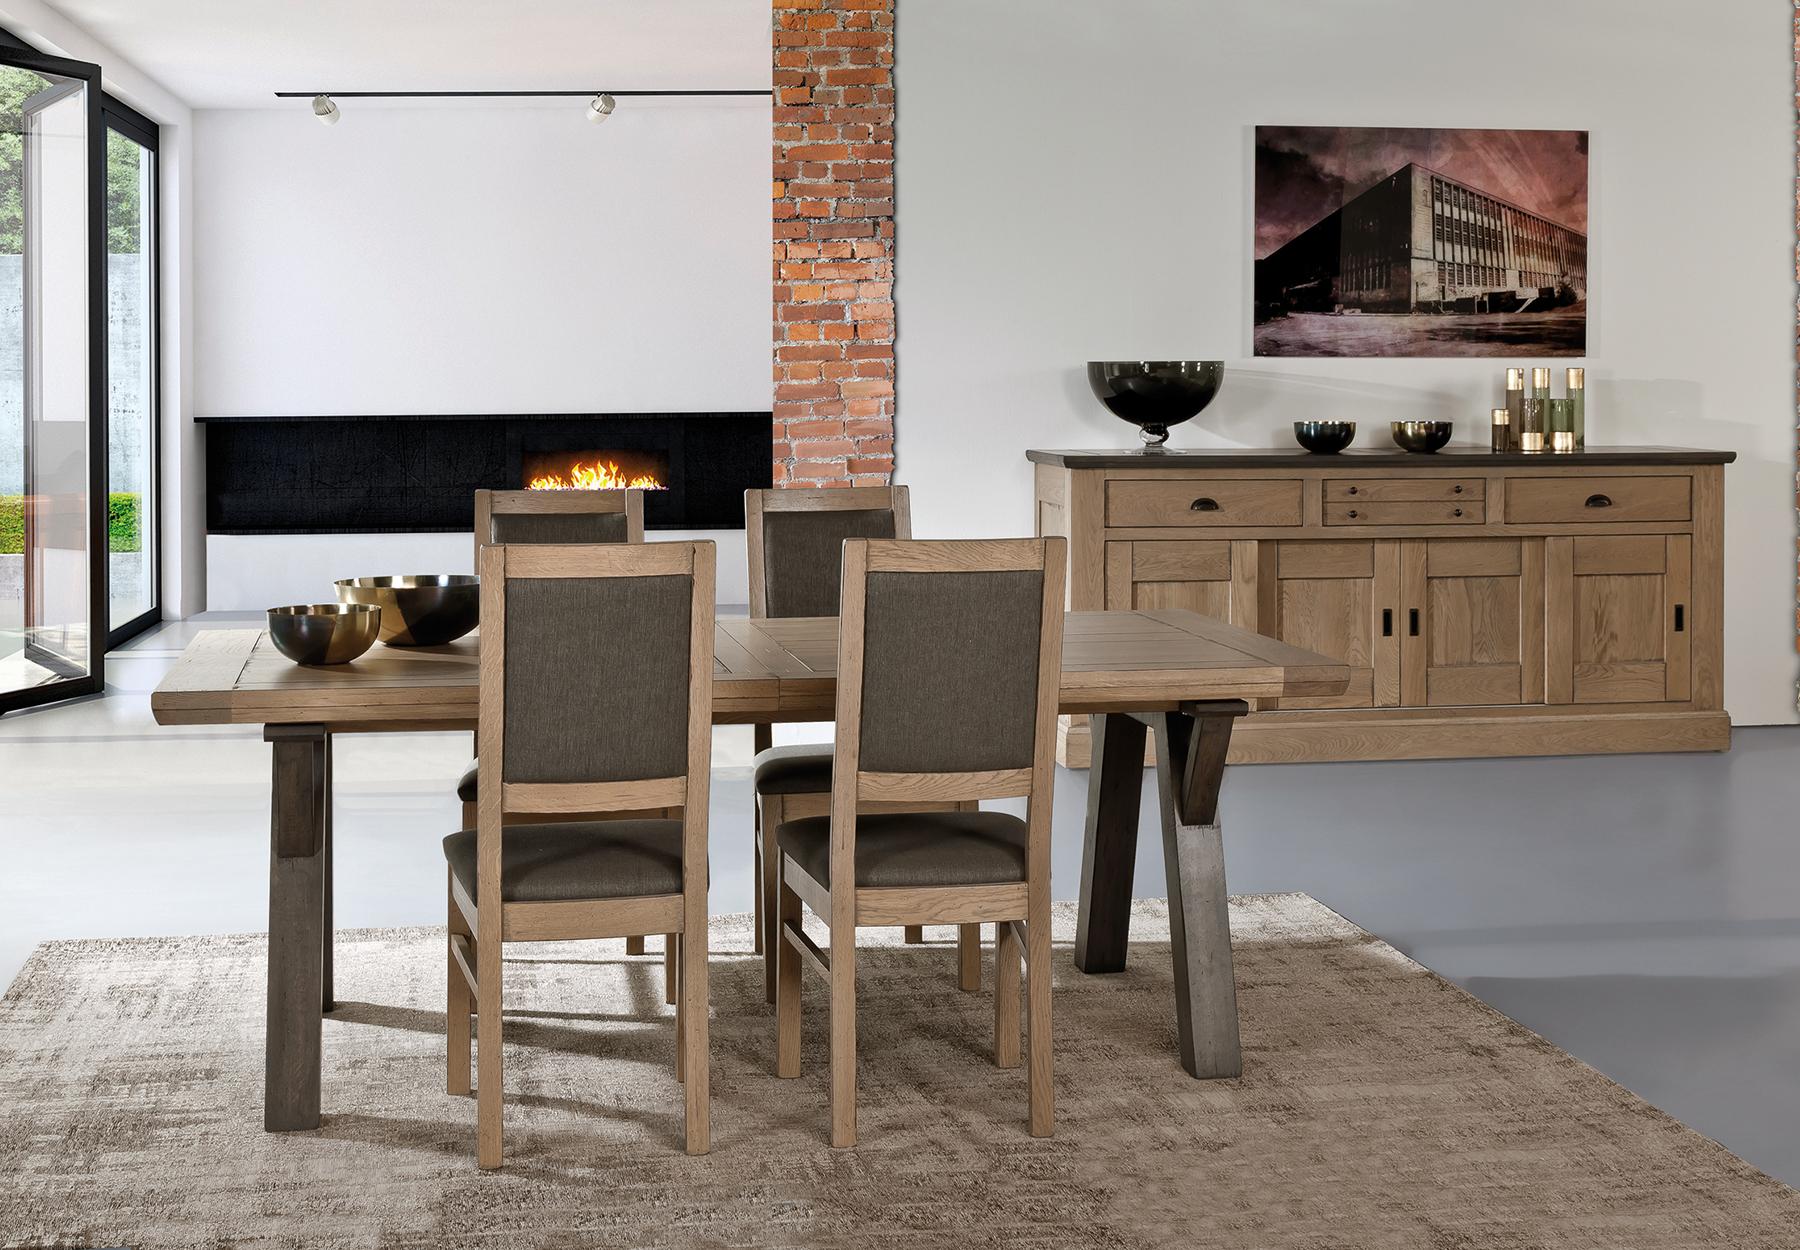 Salle a manger romance ateliers de langres meubles gibaud - Table salle a manger chene massif ...